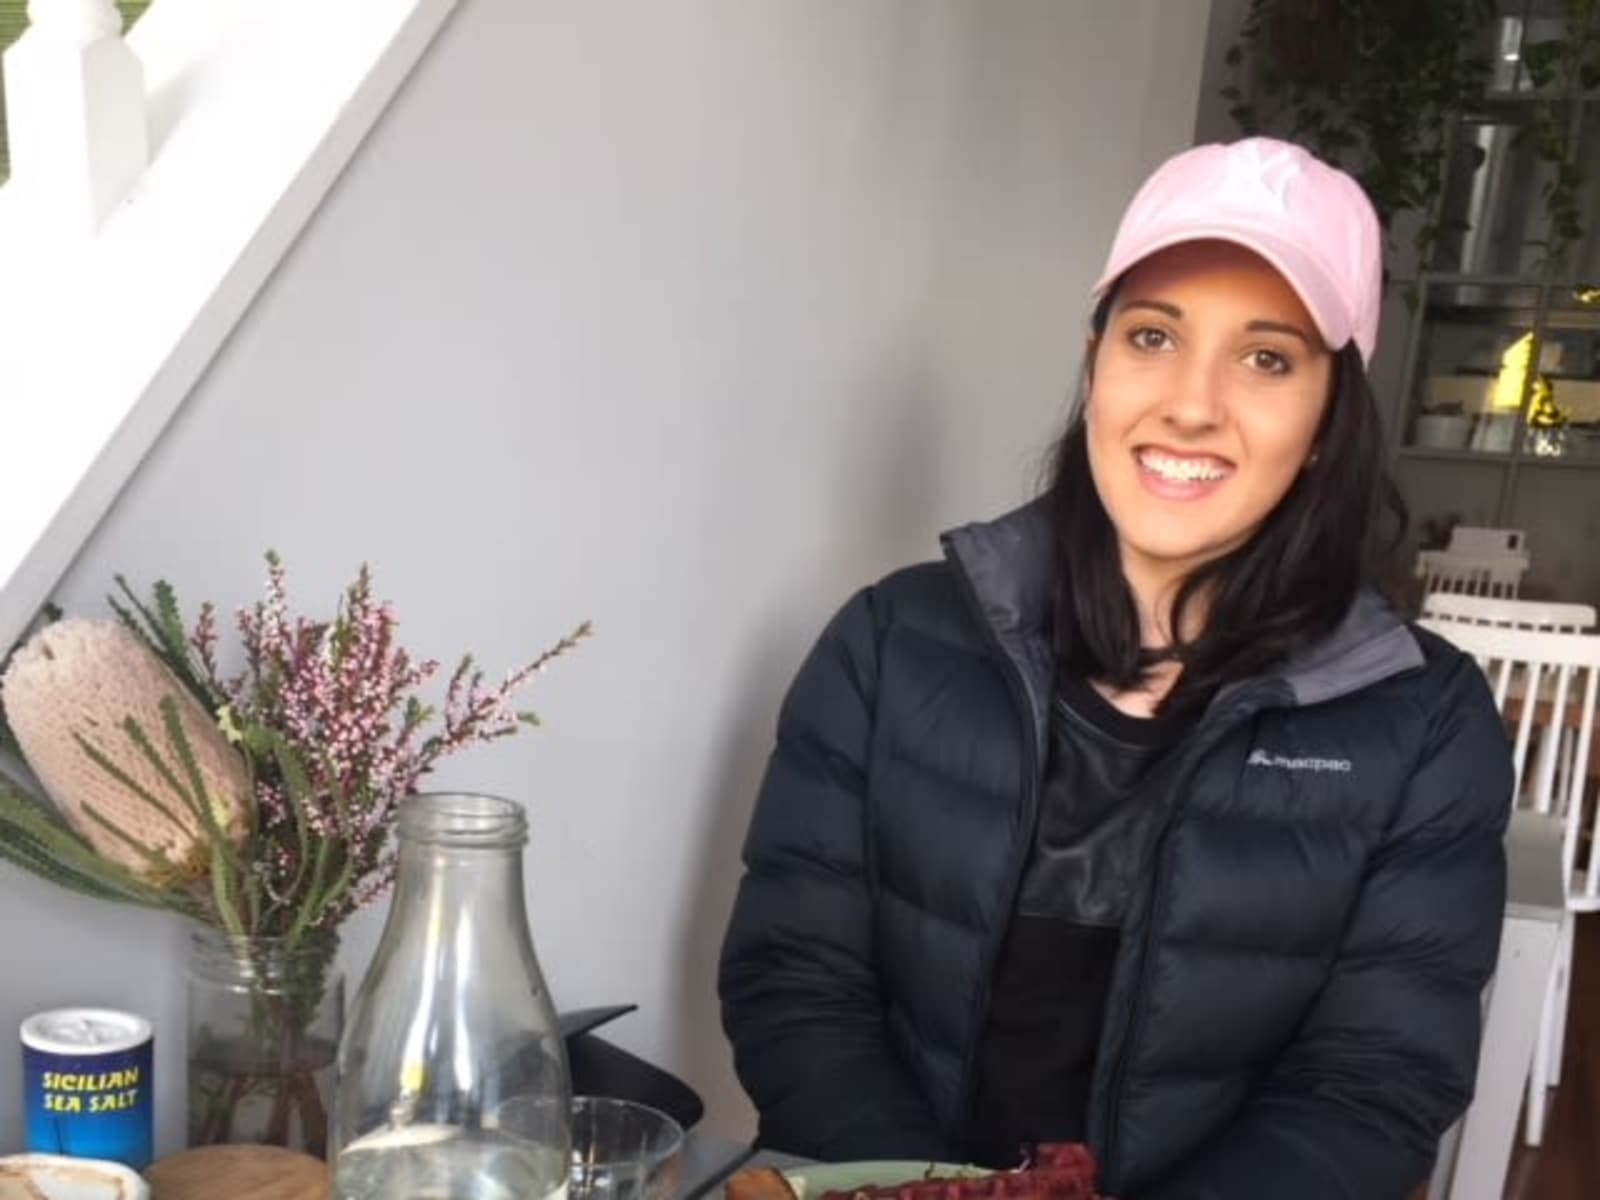 Shanae from Melbourne, Victoria, Australia